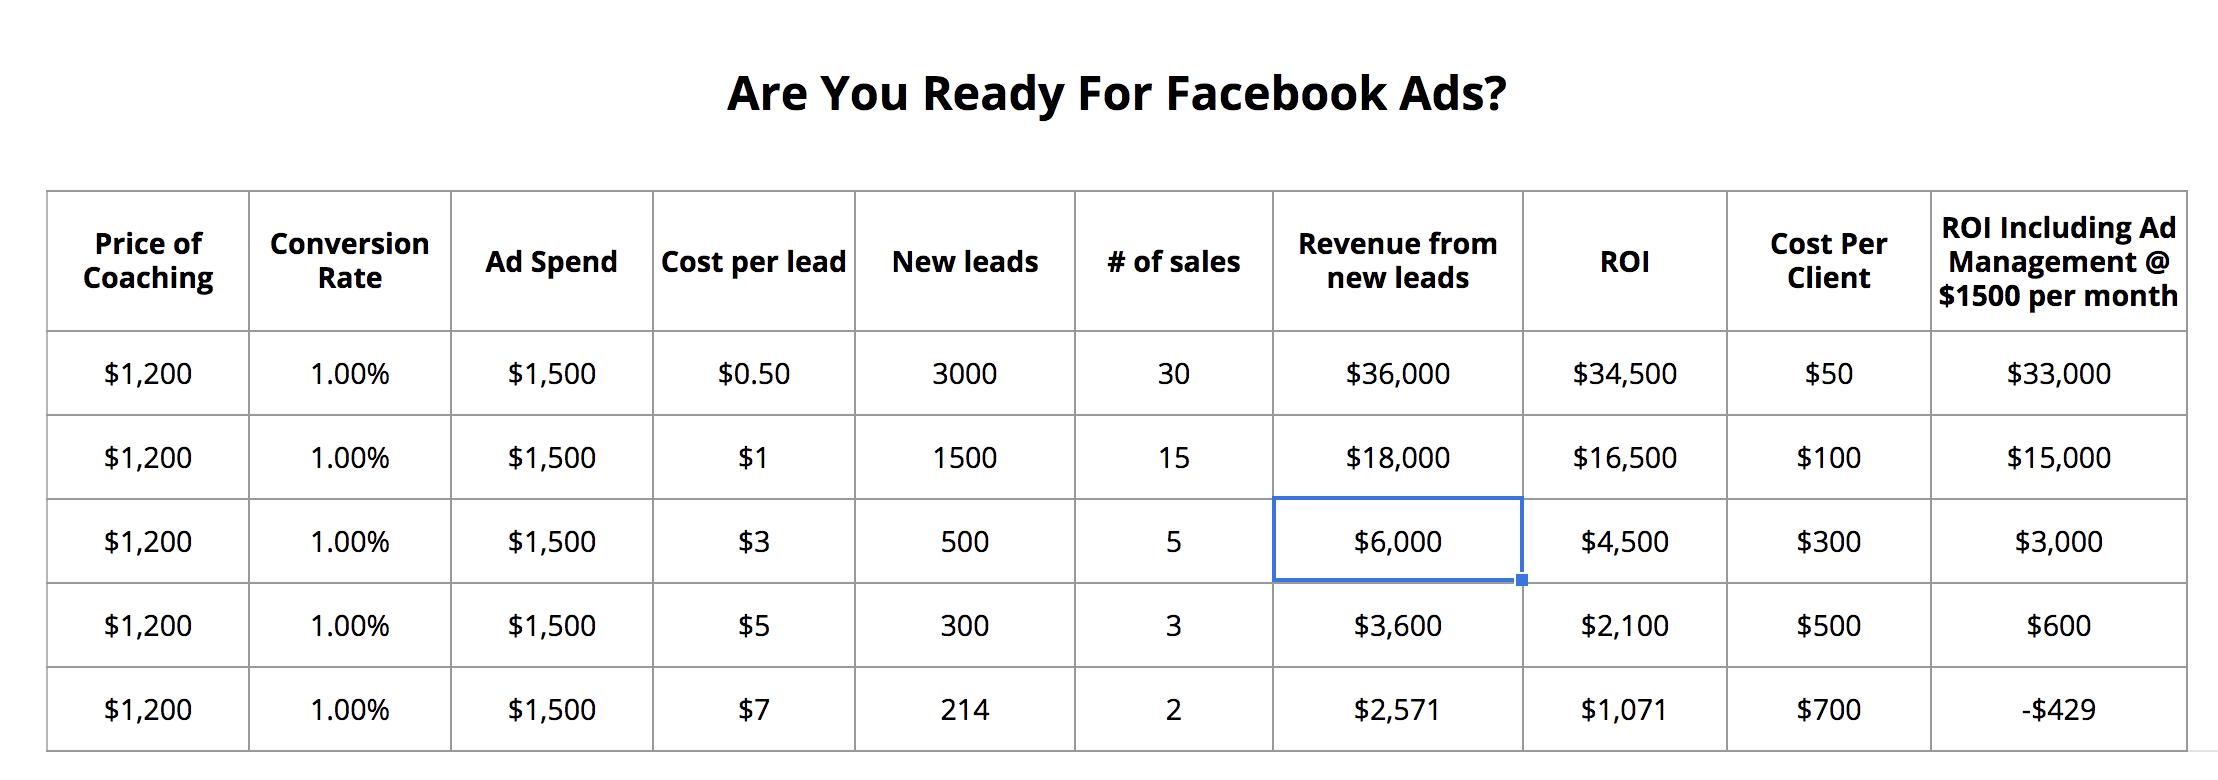 Facebook Ads ROI Calculator